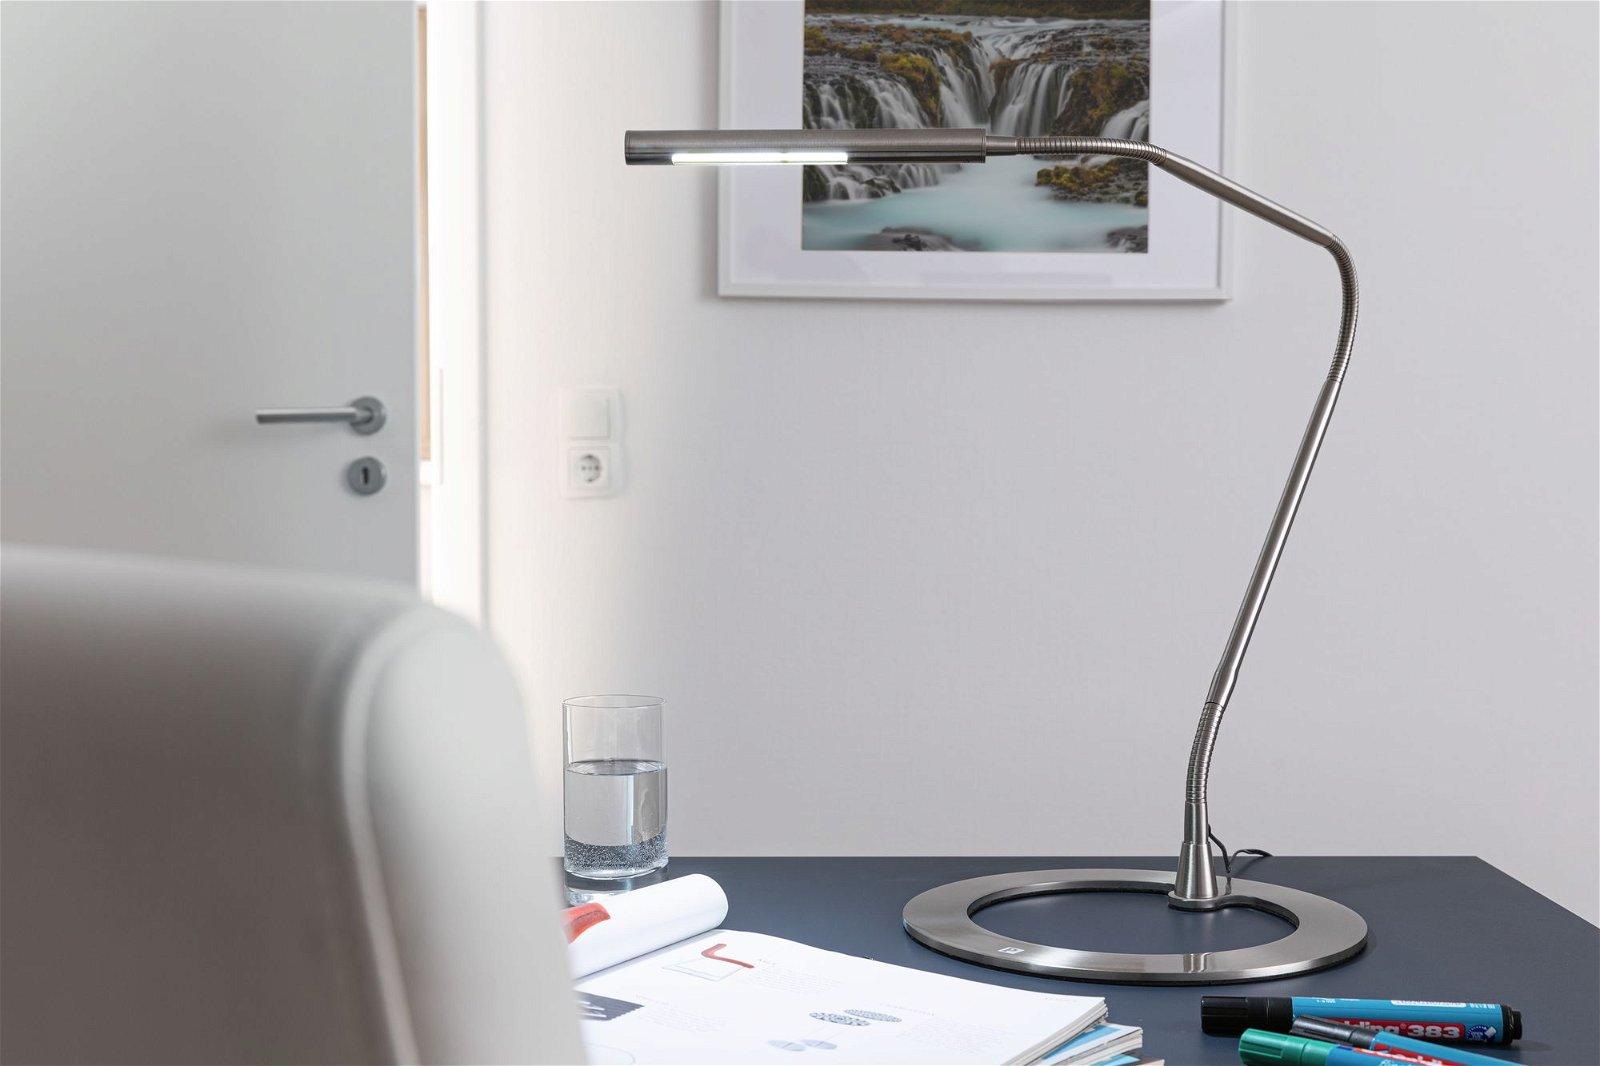 LED-bureaulamp Plaza 6000 - 7000K 240lm 3W Staal geborsteld